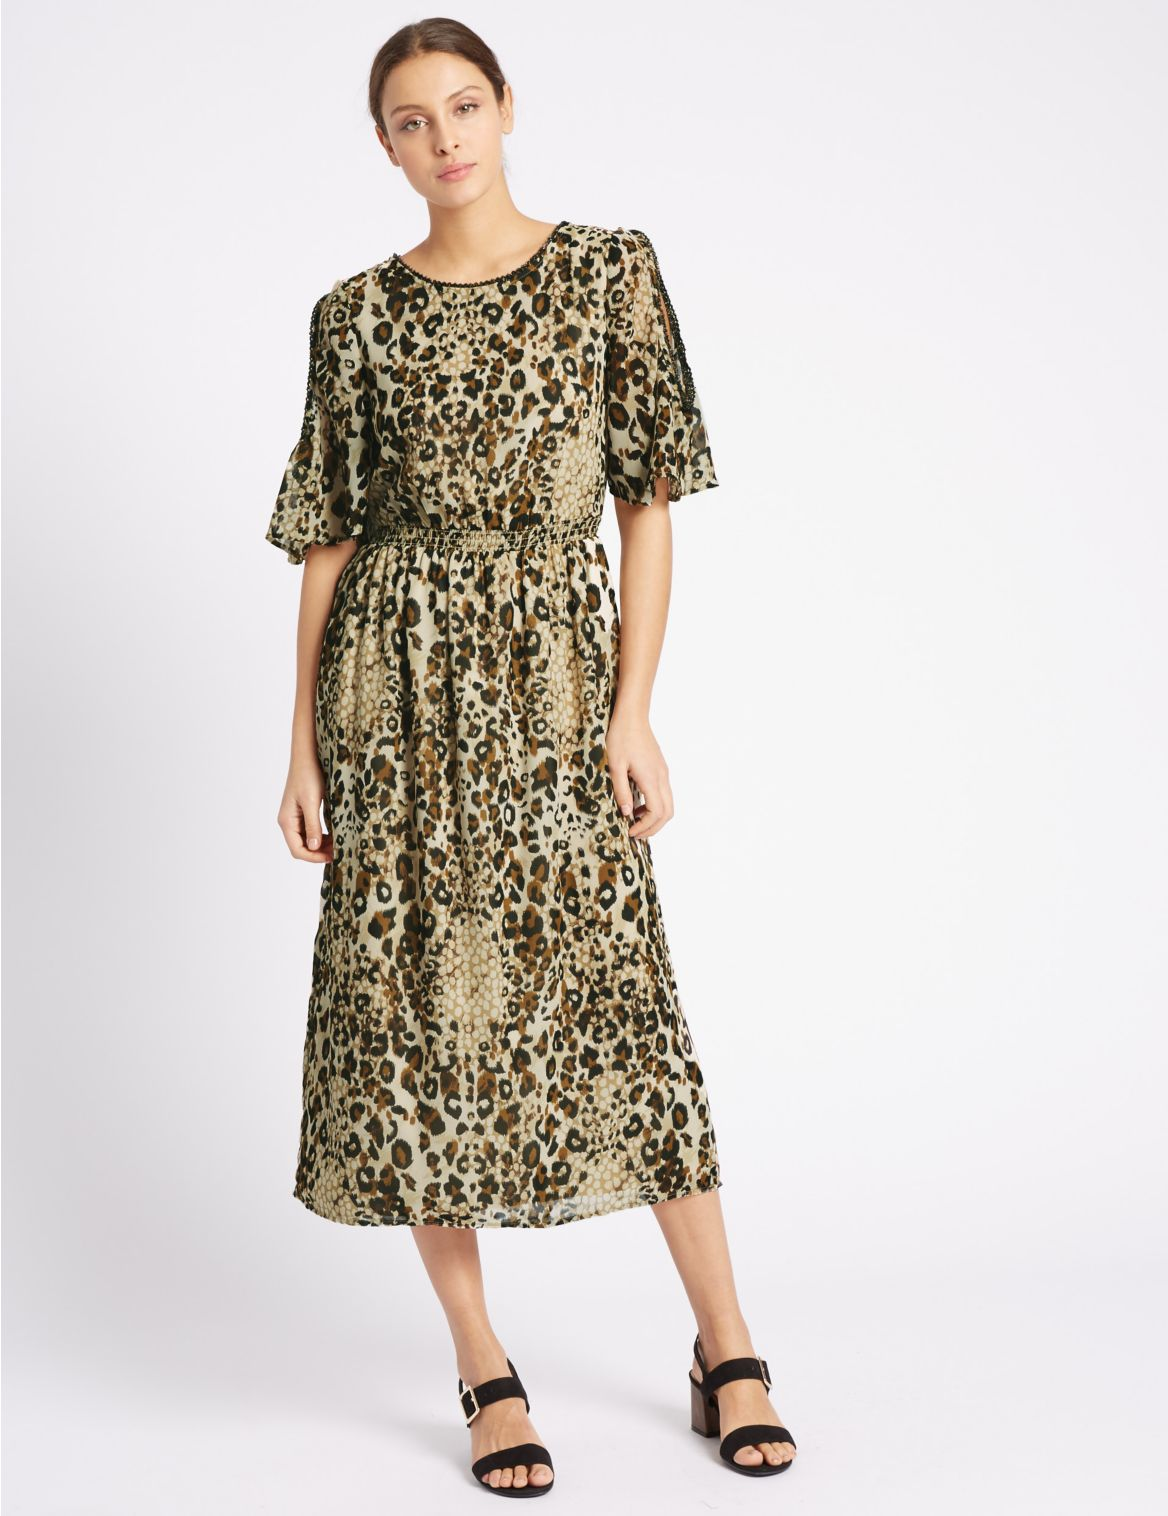 Rechte jurk met dierenprint